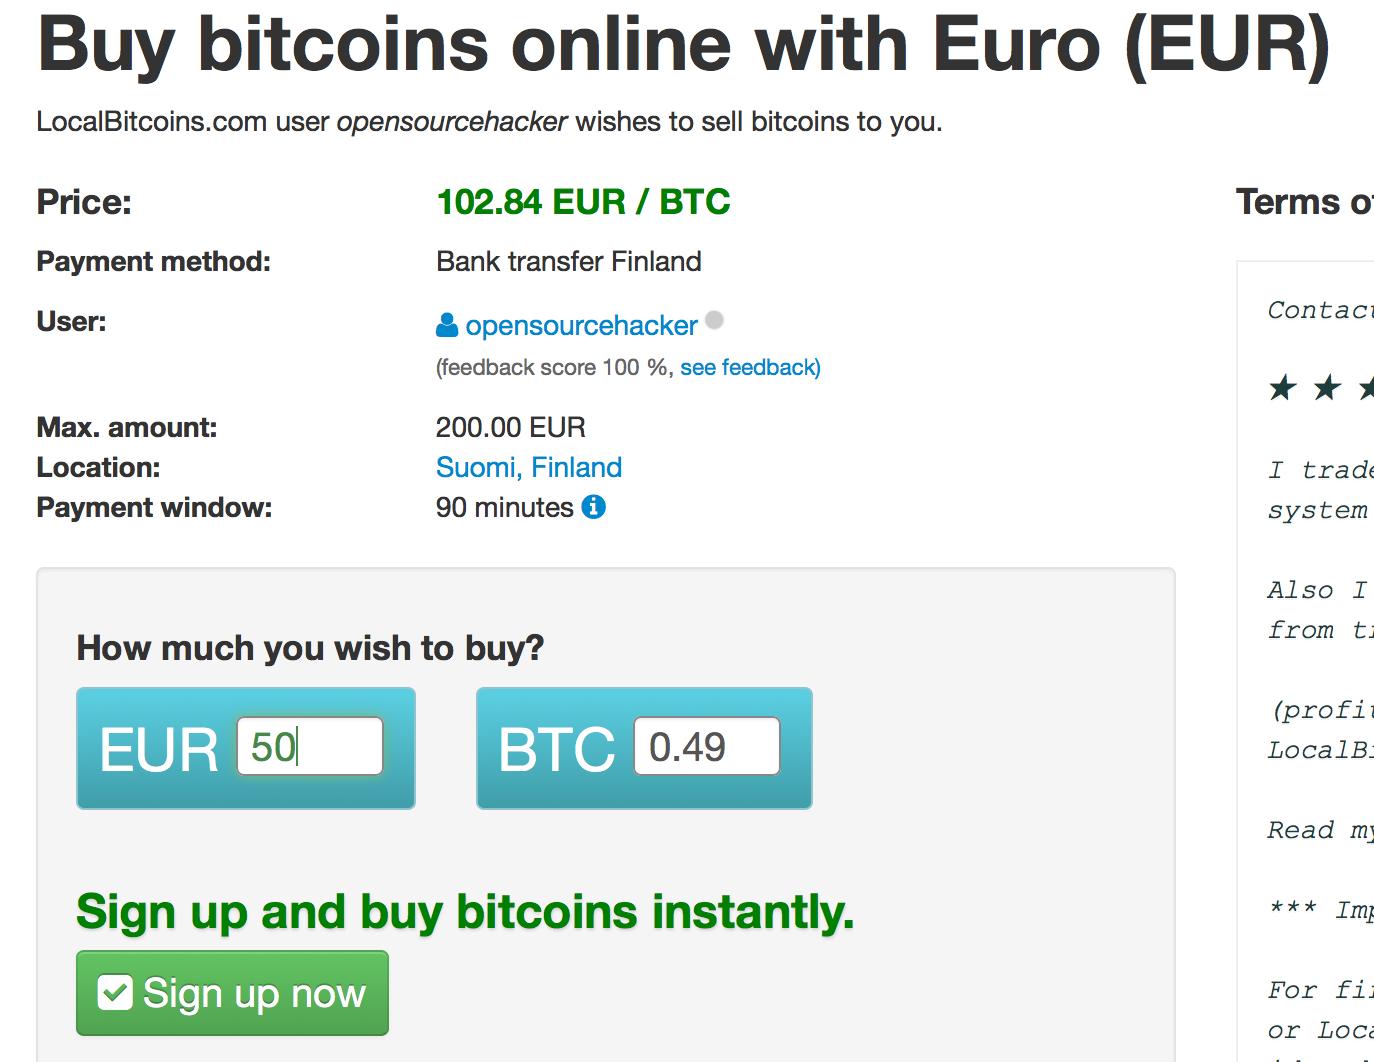 https://raw.github.com/miohtama/django-bitcoin-example/master/images/buy.png